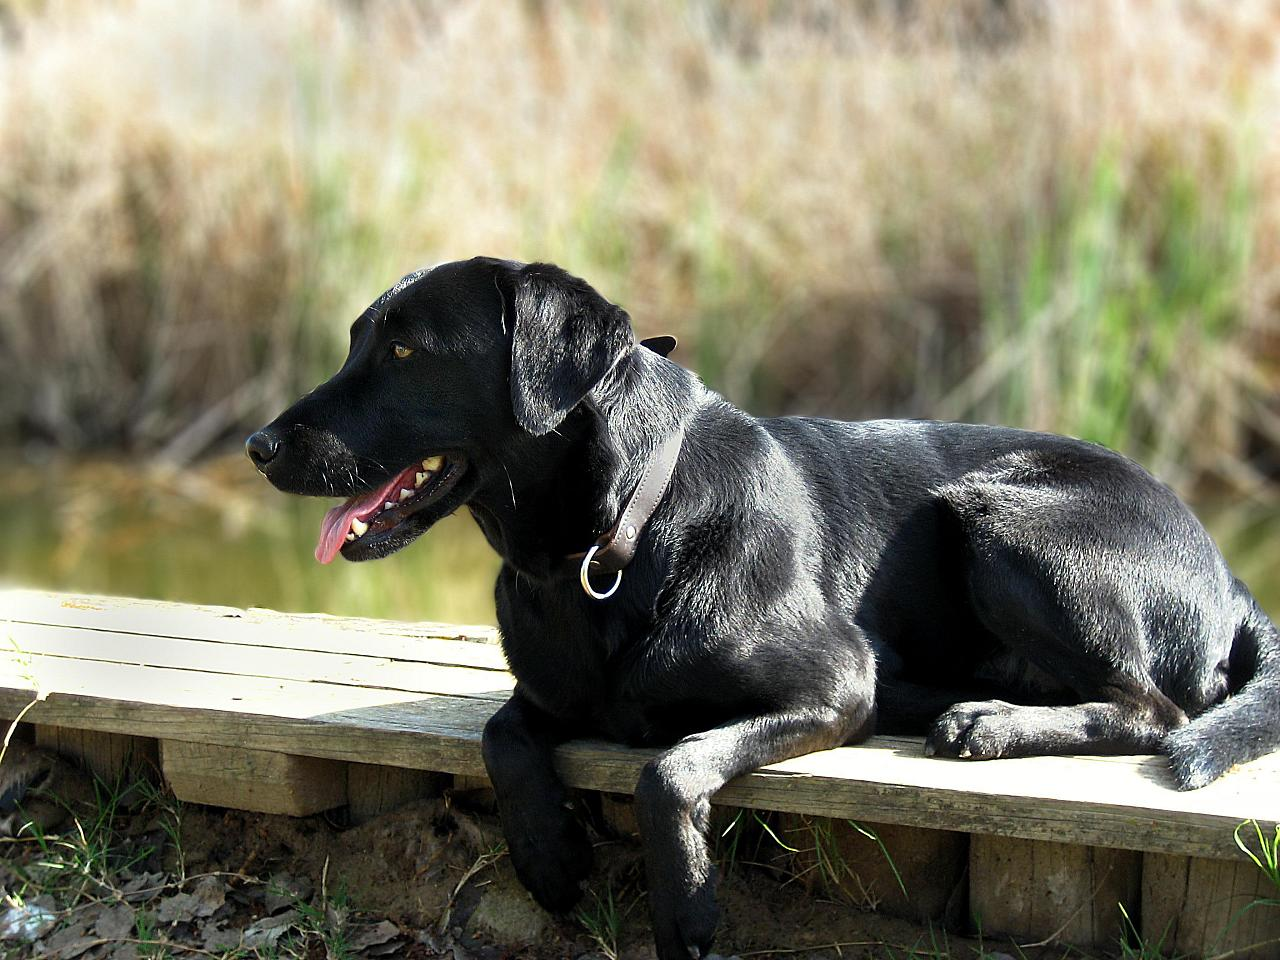 Labrador retriever   Fotos Tu amigo el perro 1280x960